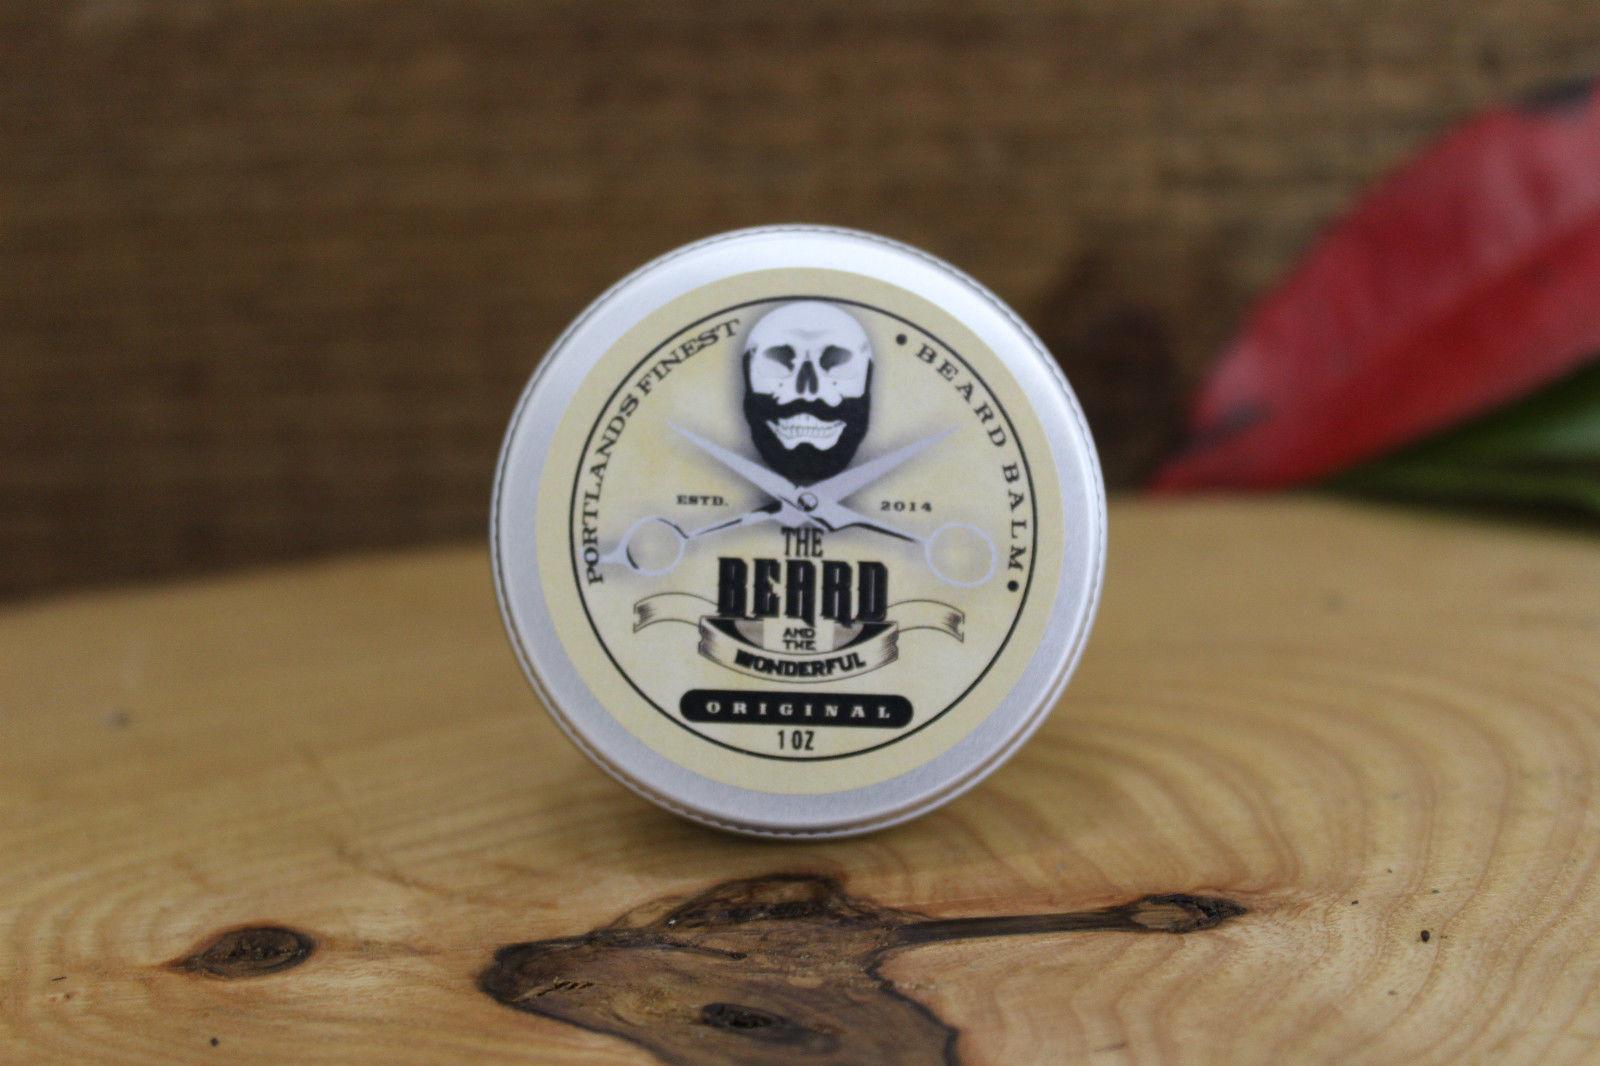 The Beard and The Wonderful, BIG Beard Taming Balm. 30ml (1oz) Tin Unscented